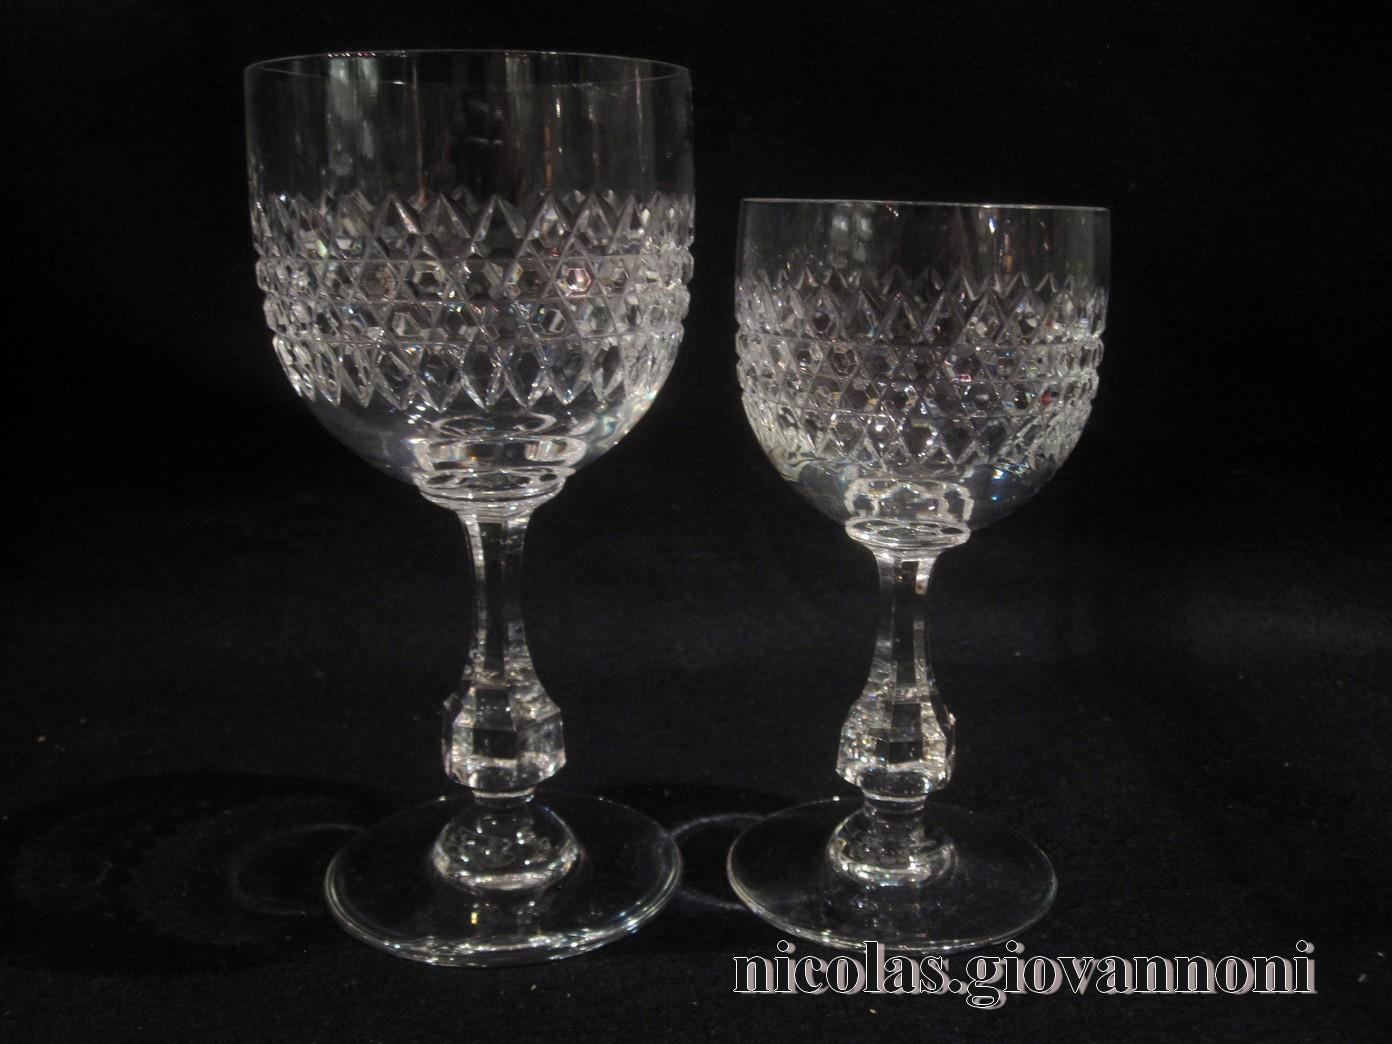 8 verres vin rouge 8 vin blanc lucullus baccarat cristal catalogue cristal de. Black Bedroom Furniture Sets. Home Design Ideas